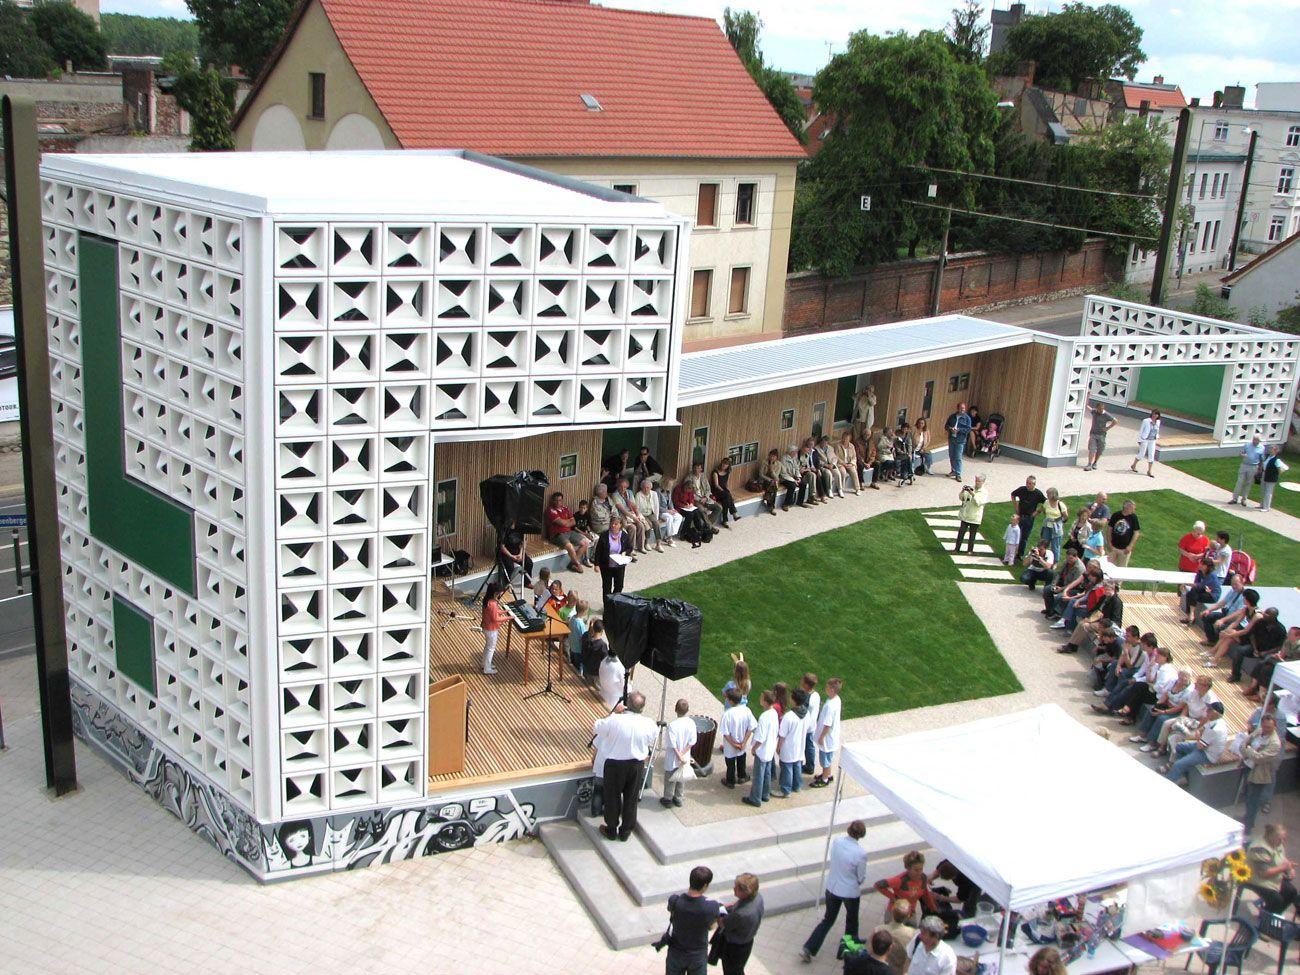 Architekt Magdeburg lz oben 2009 open air library magdeburg germany karo